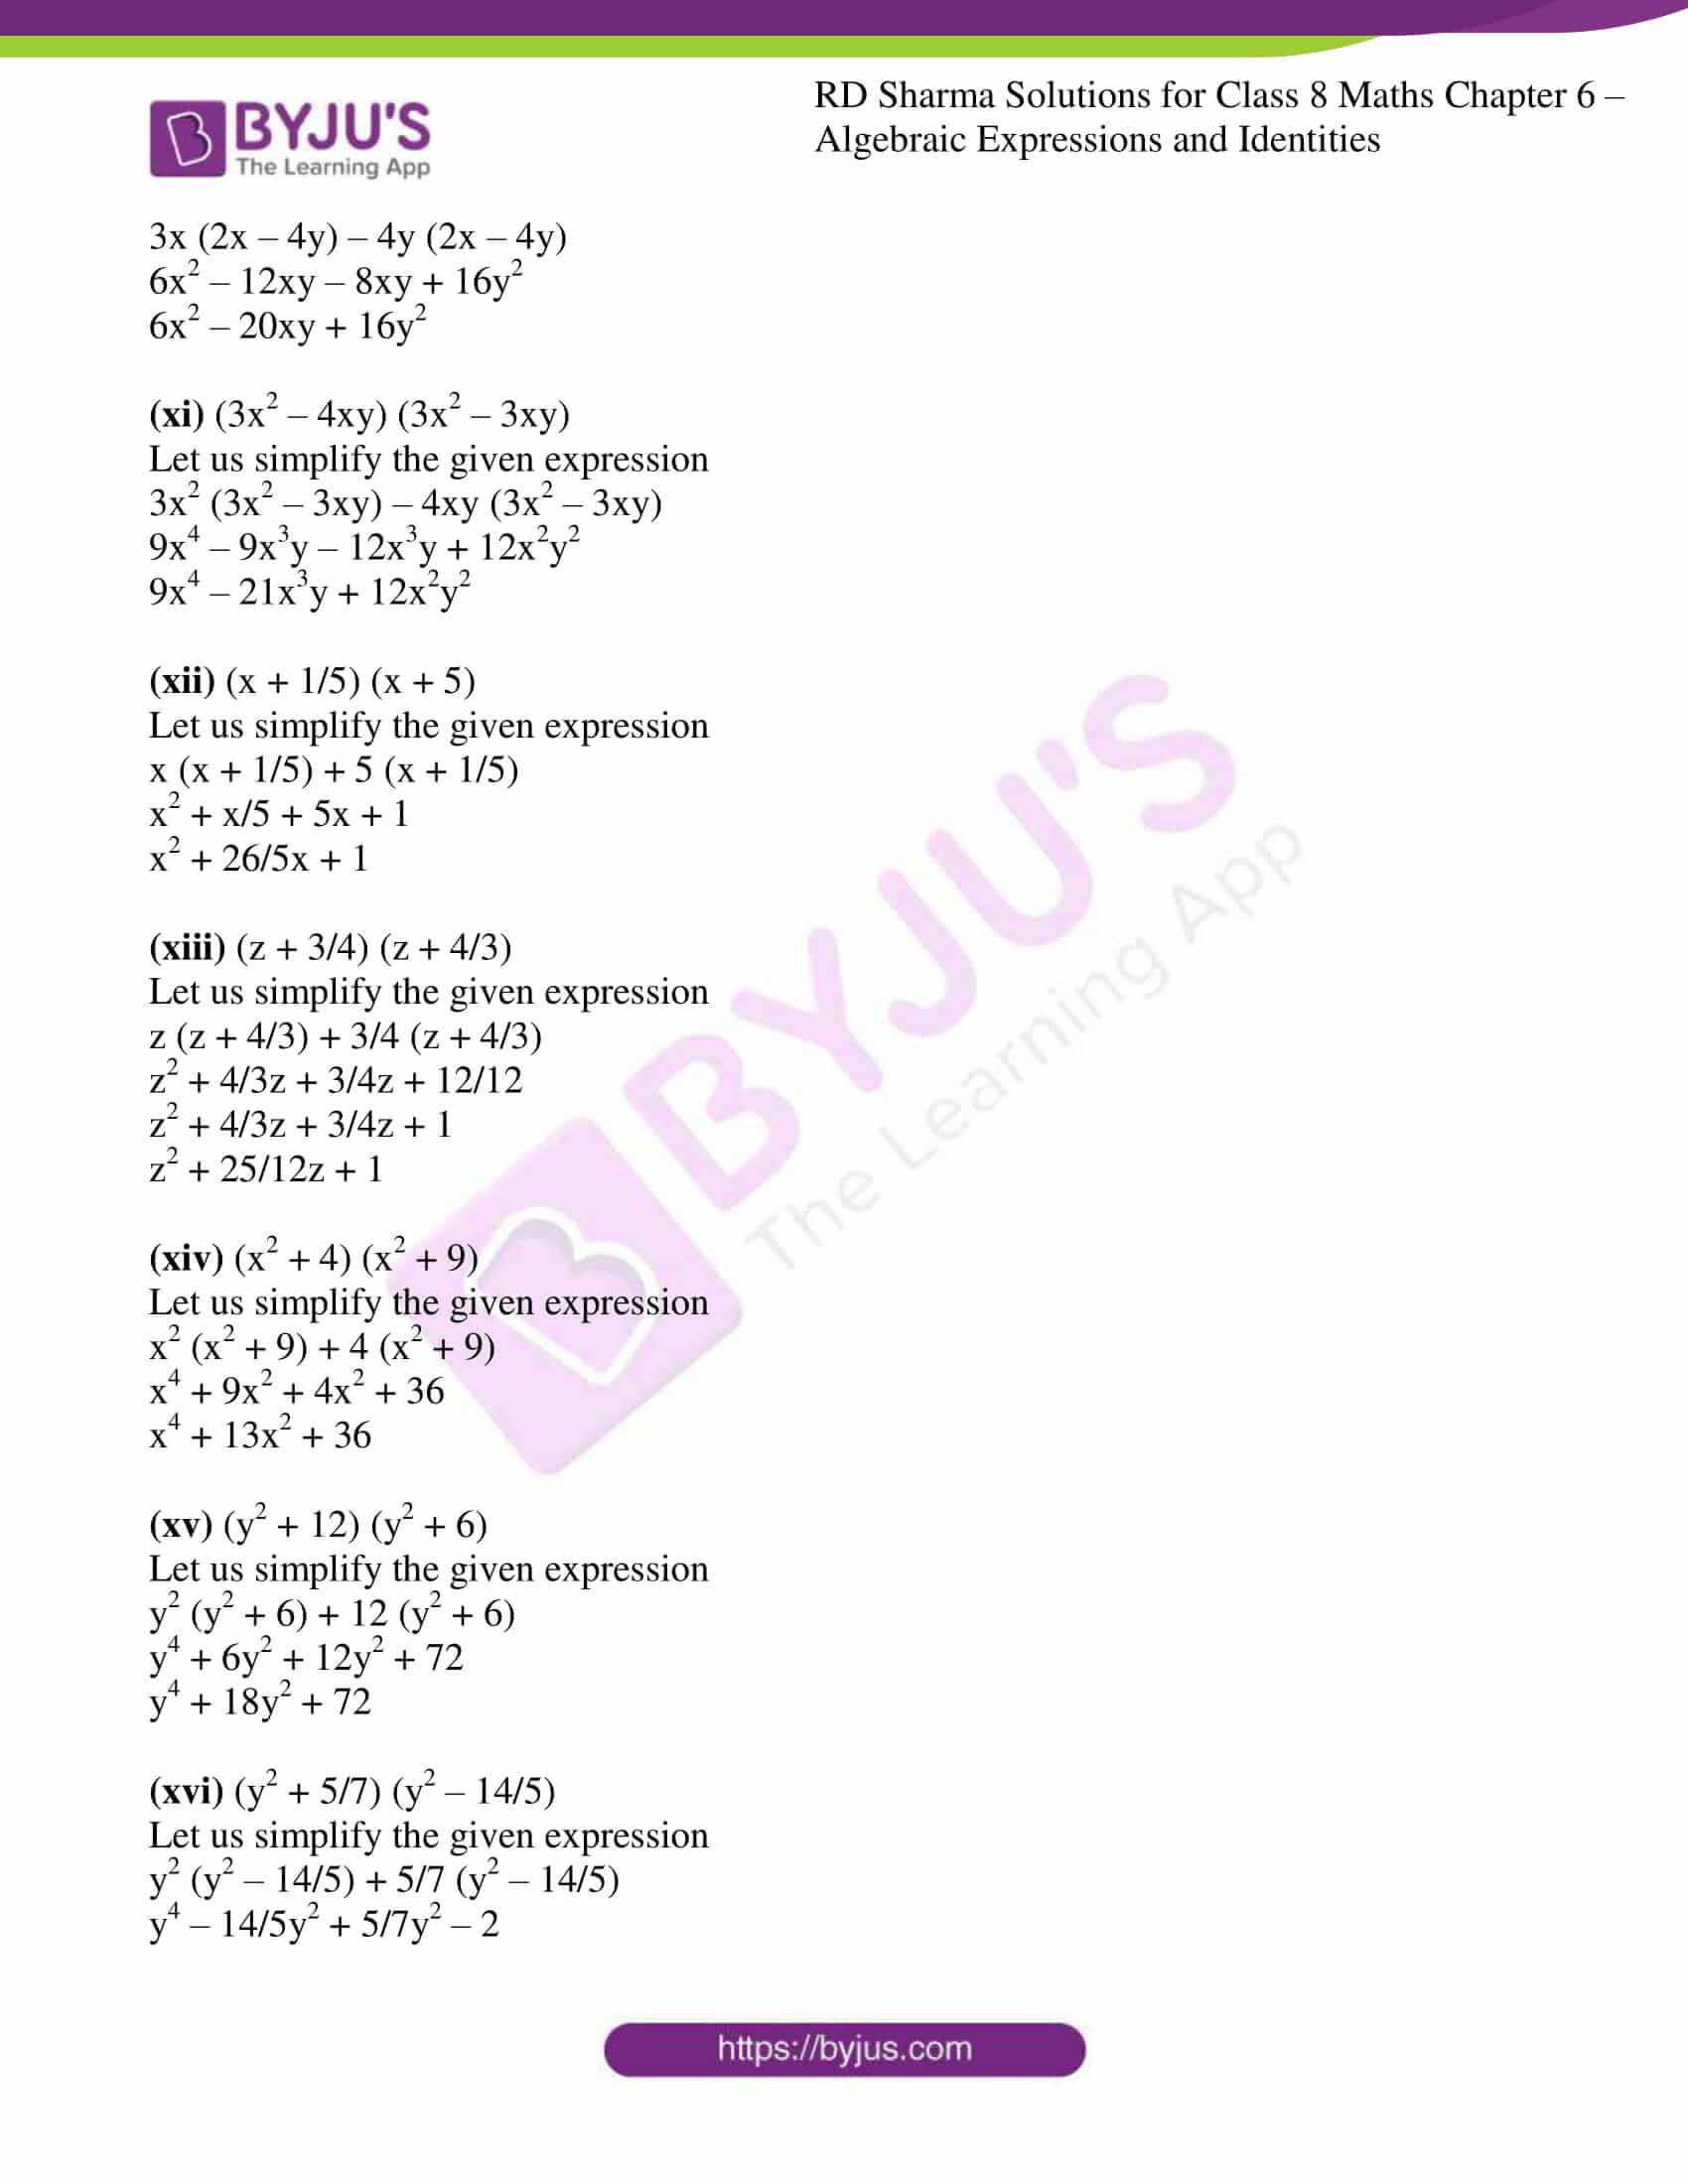 rd sharma class 8 maths chapter 6 exercise 7 3